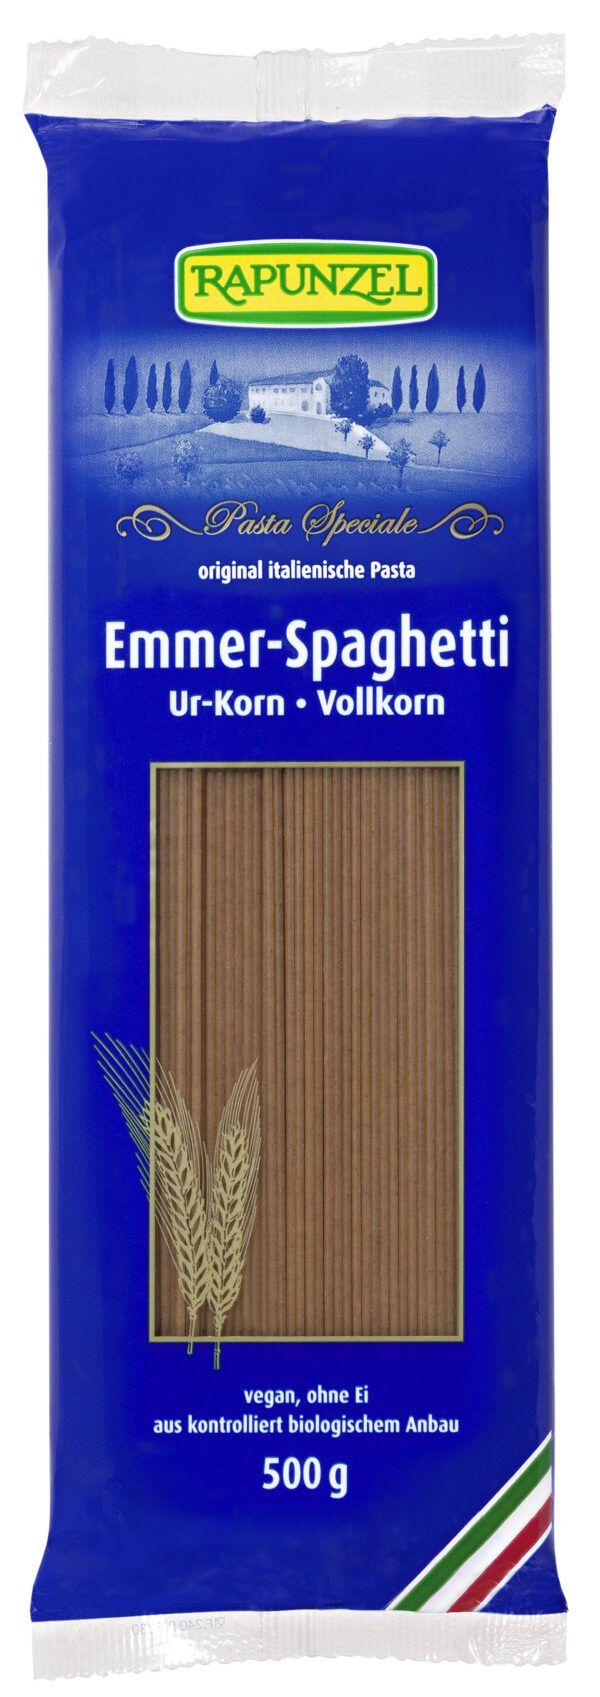 Rapunzel Emmer-Spaghetti Vollkorn 500g